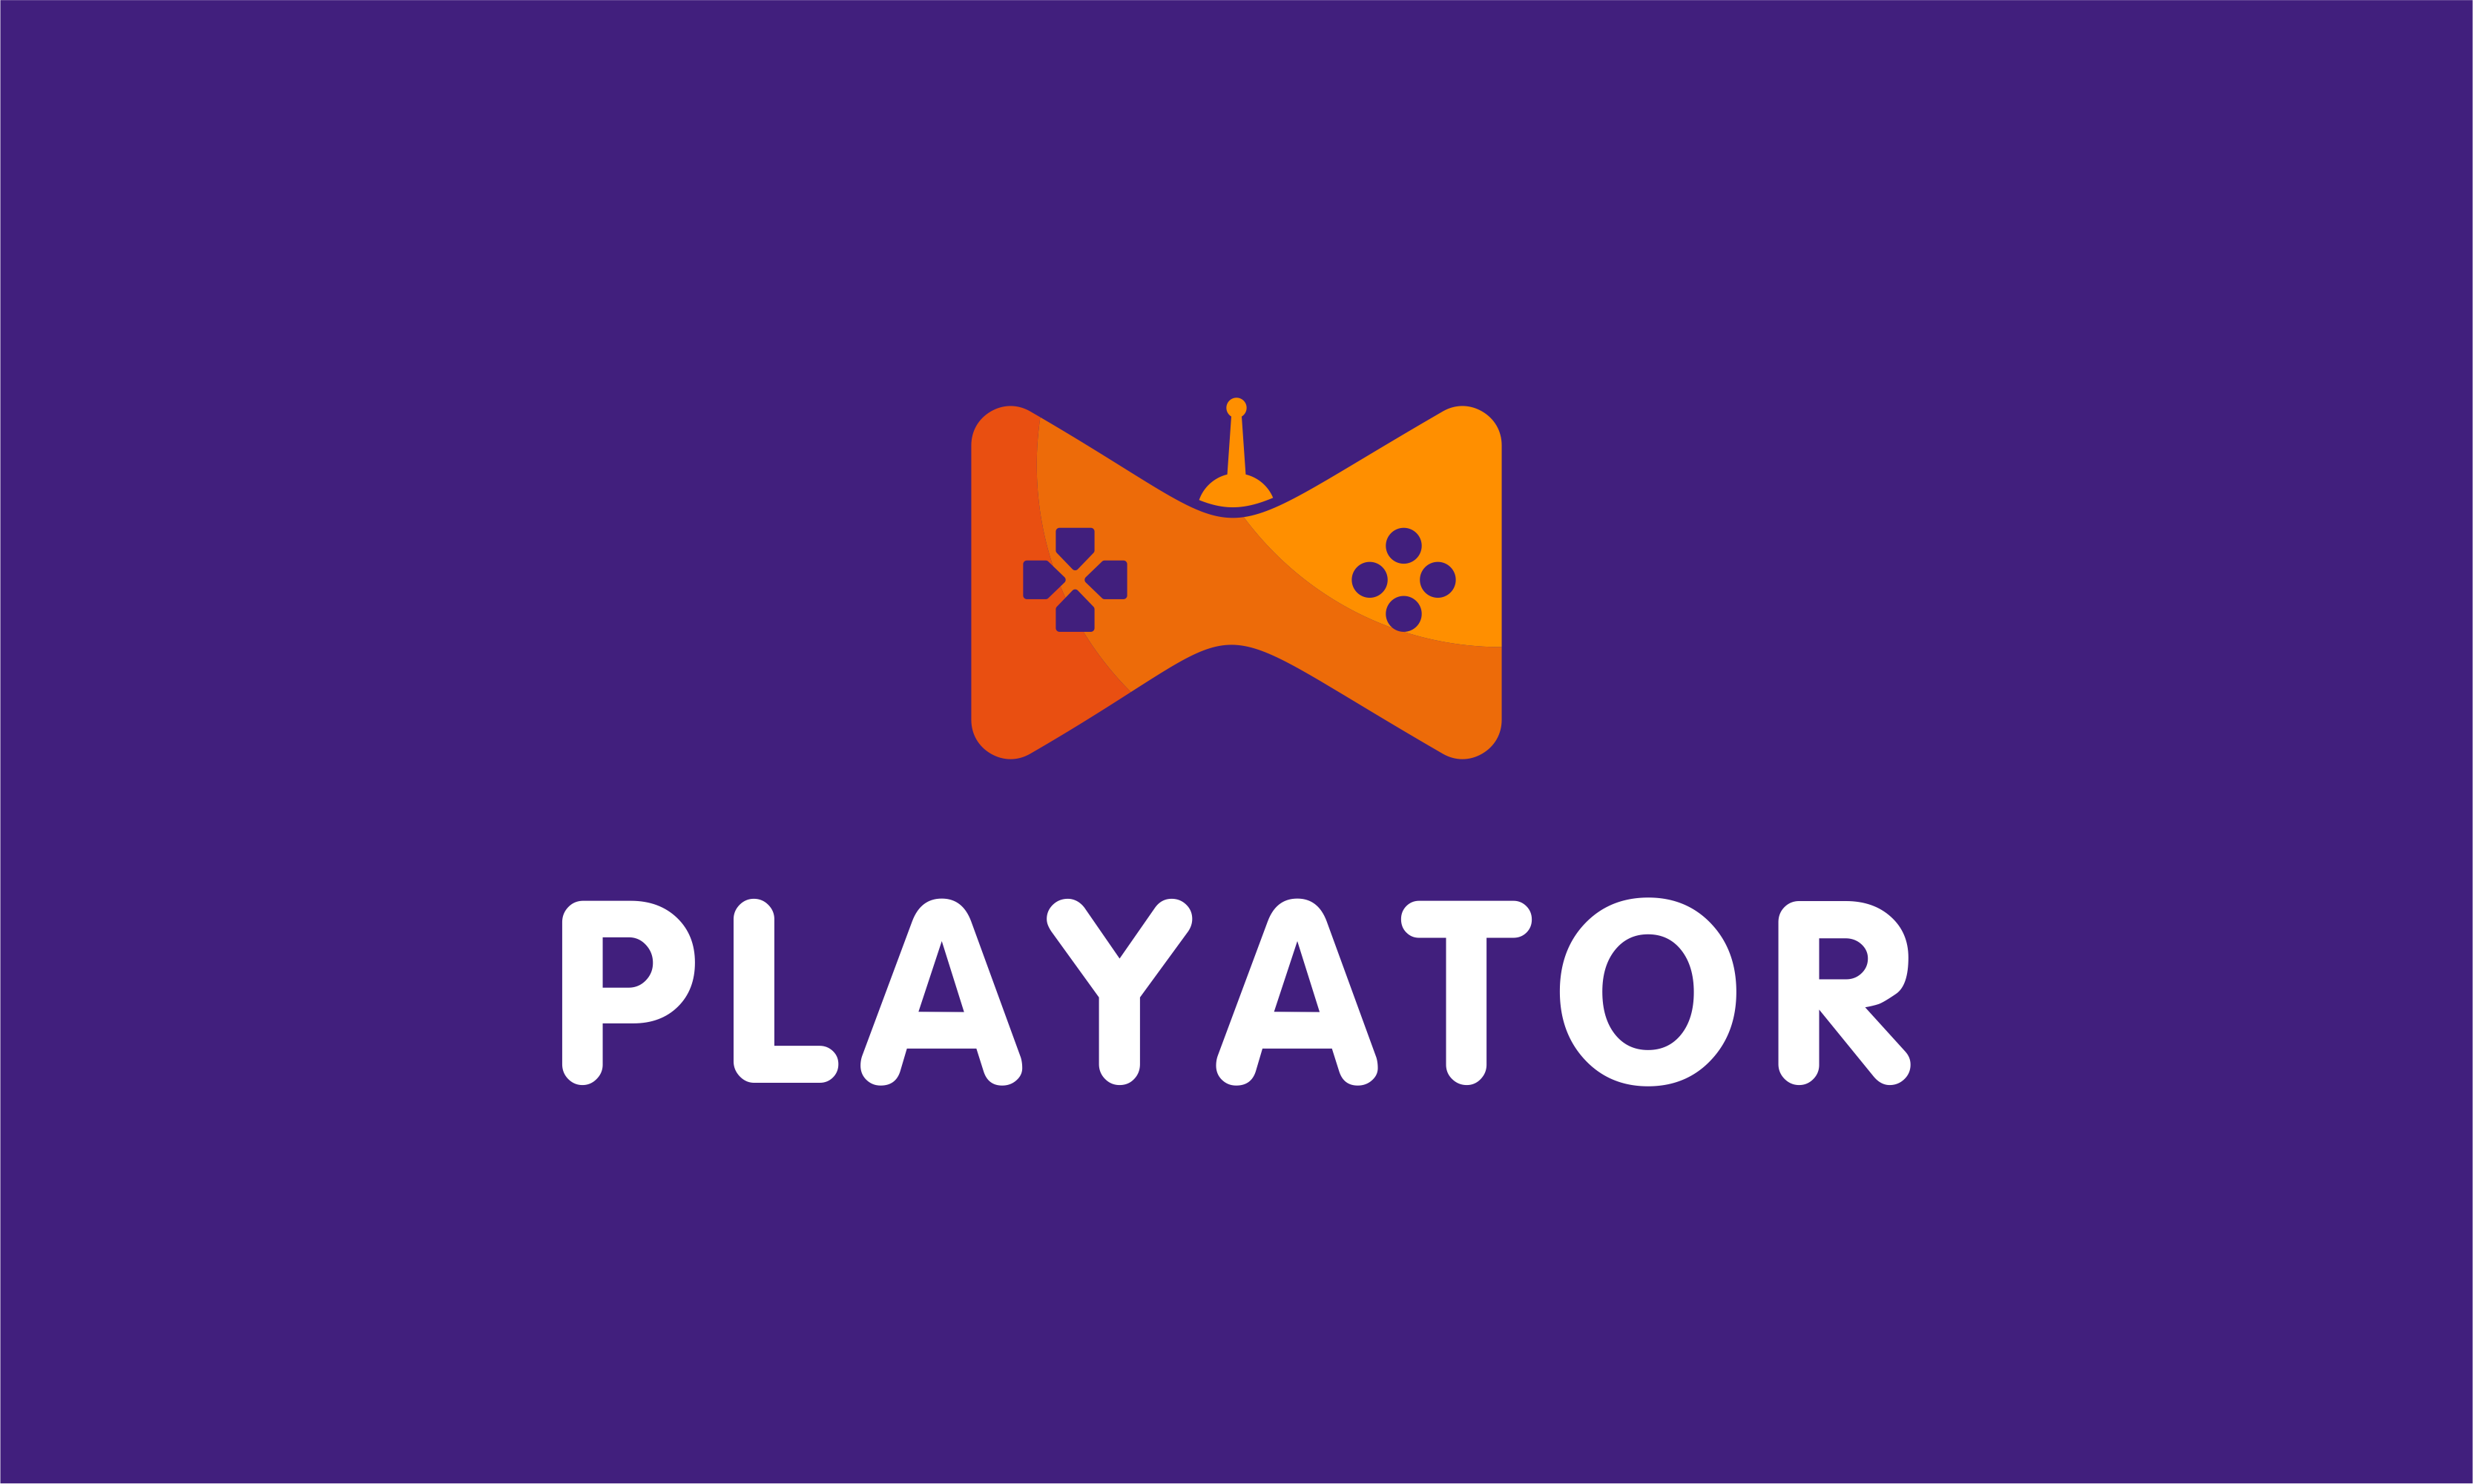 Playator